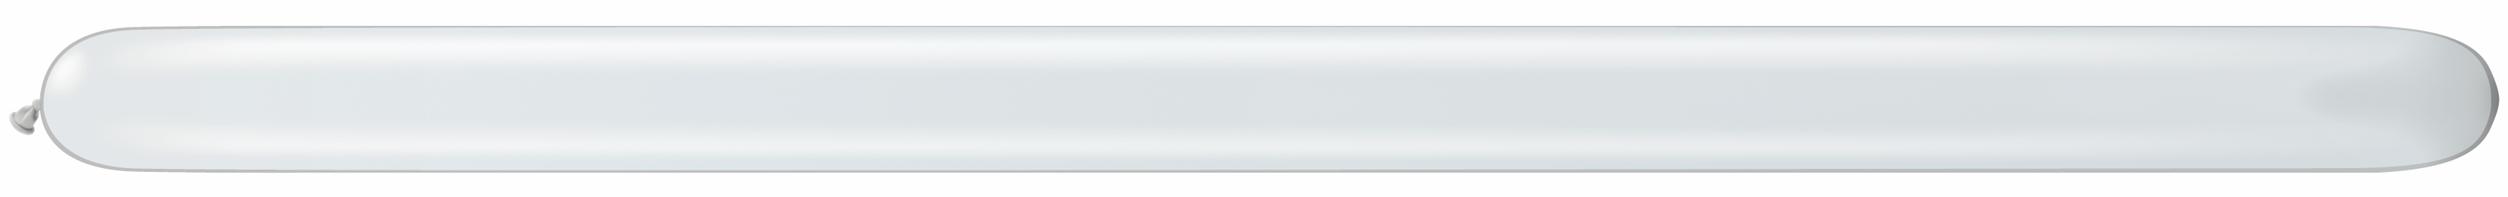 350Q Latex Balloons (100 Count) Jewel Diamond Clear